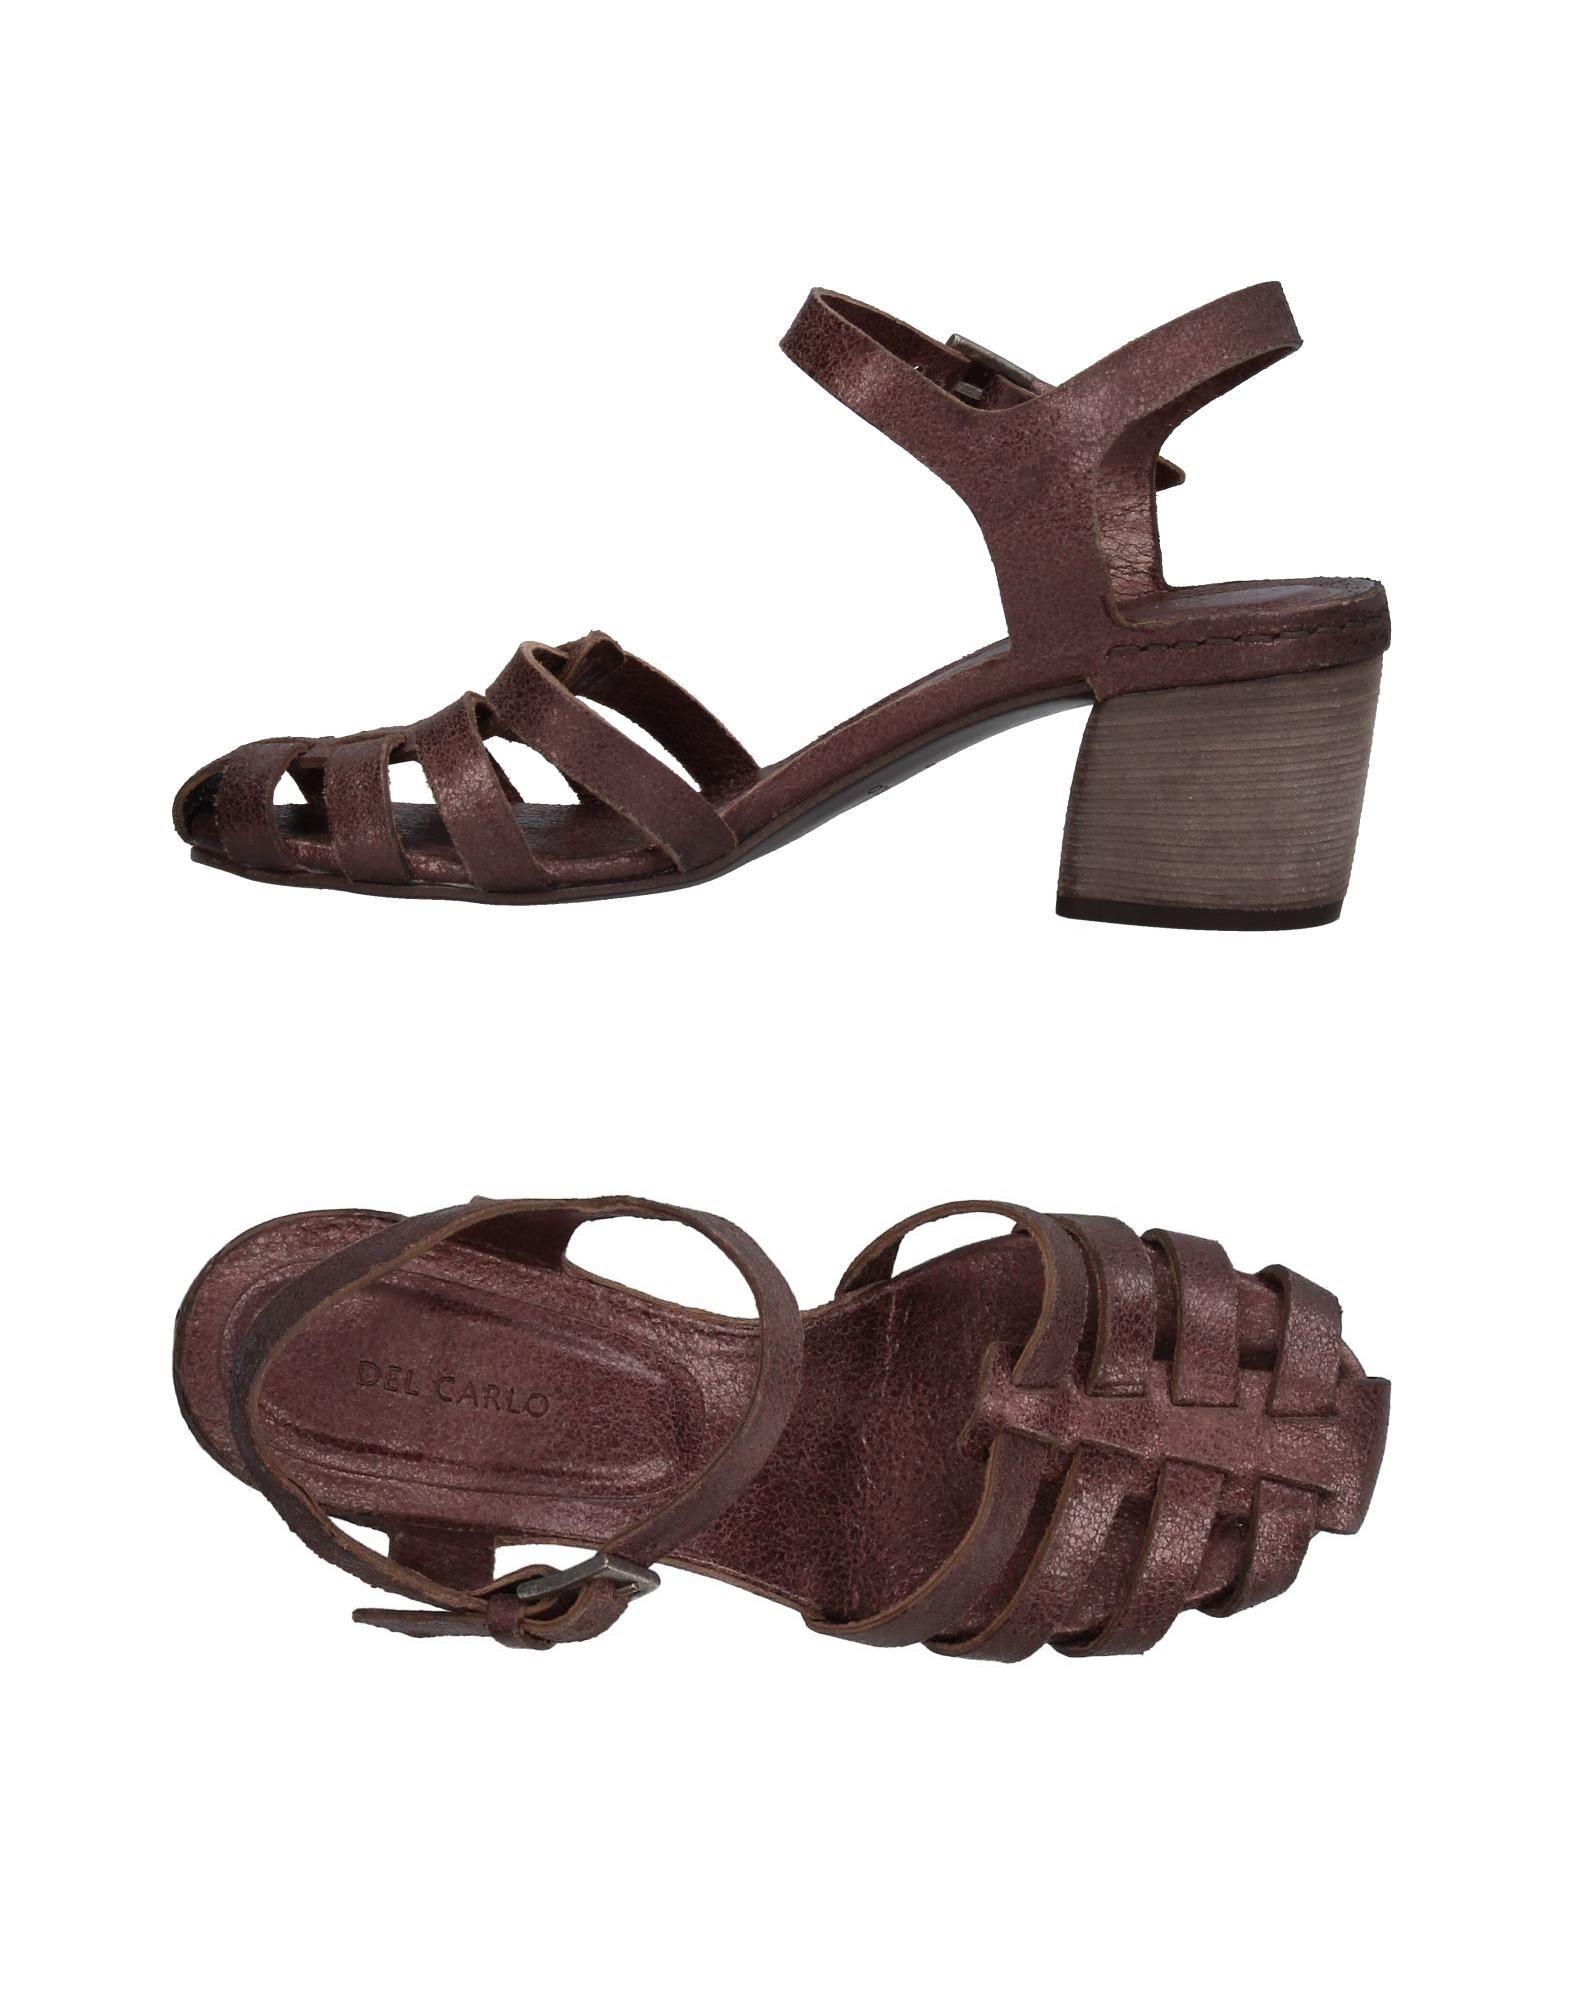 DEL CARLO Damen Sandale Farbe Pflaume Größe 9